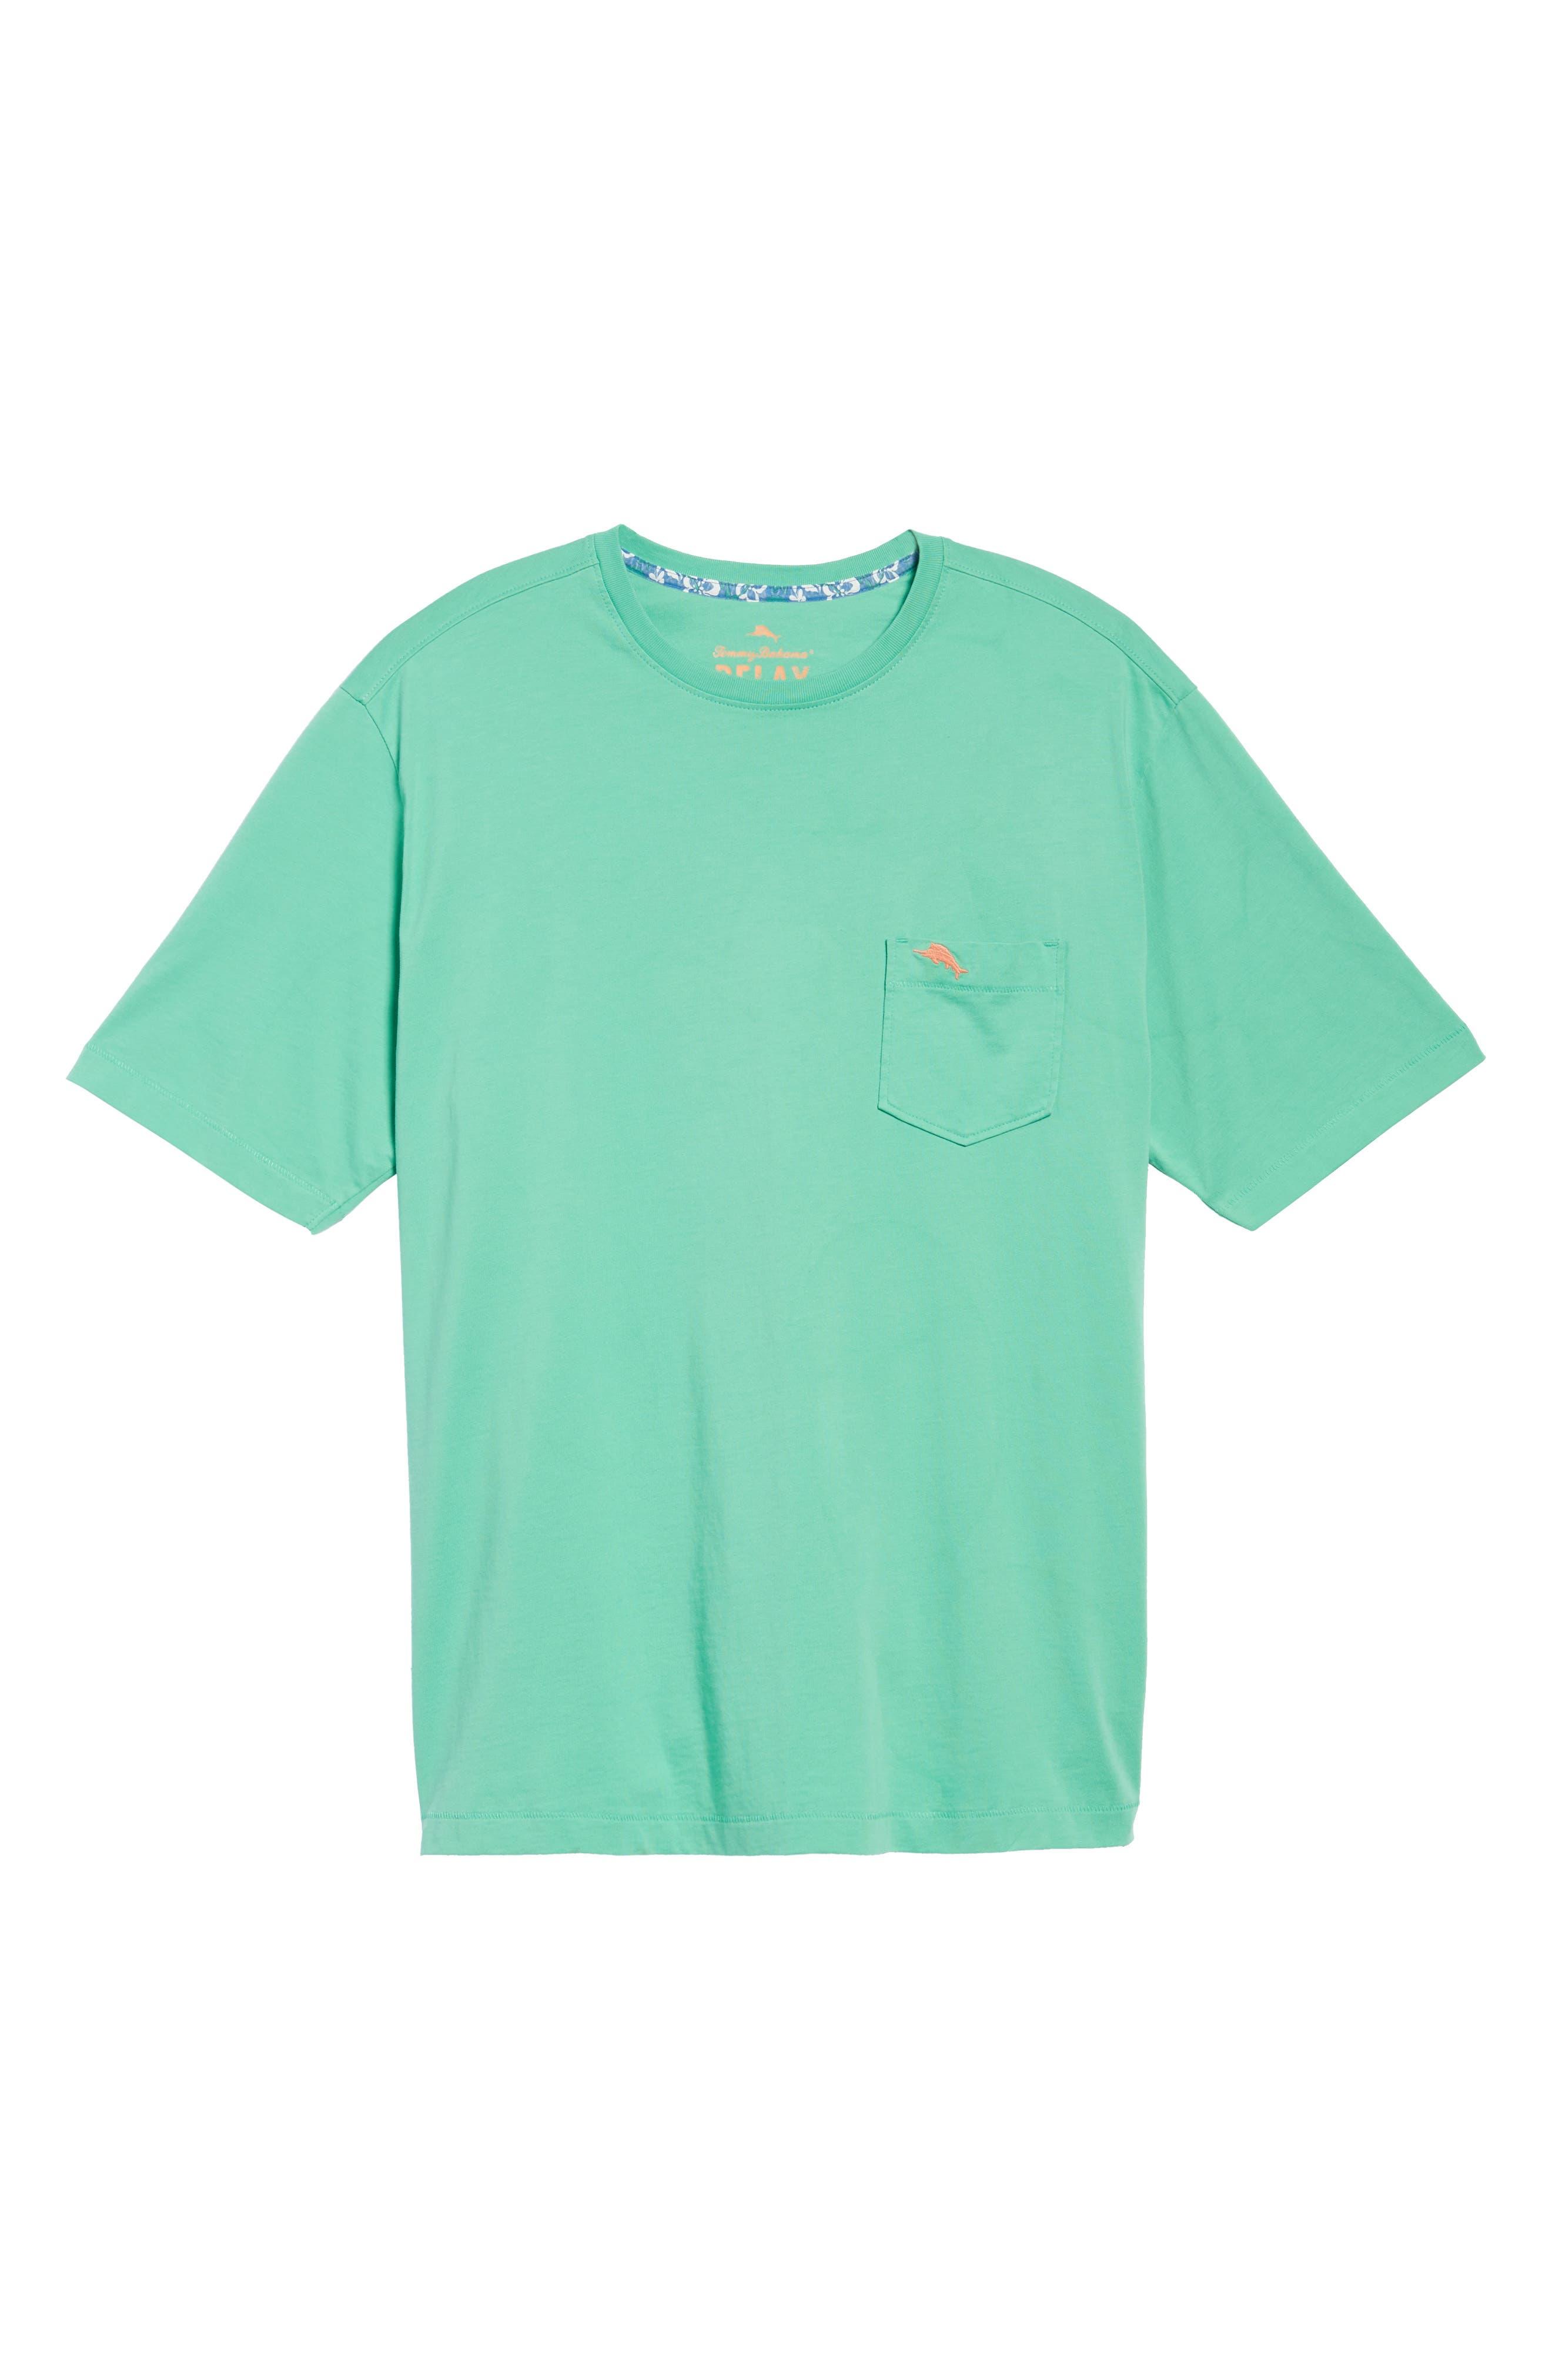 Bali Skyline Pocket T-Shirt,                             Alternate thumbnail 6, color,                             300